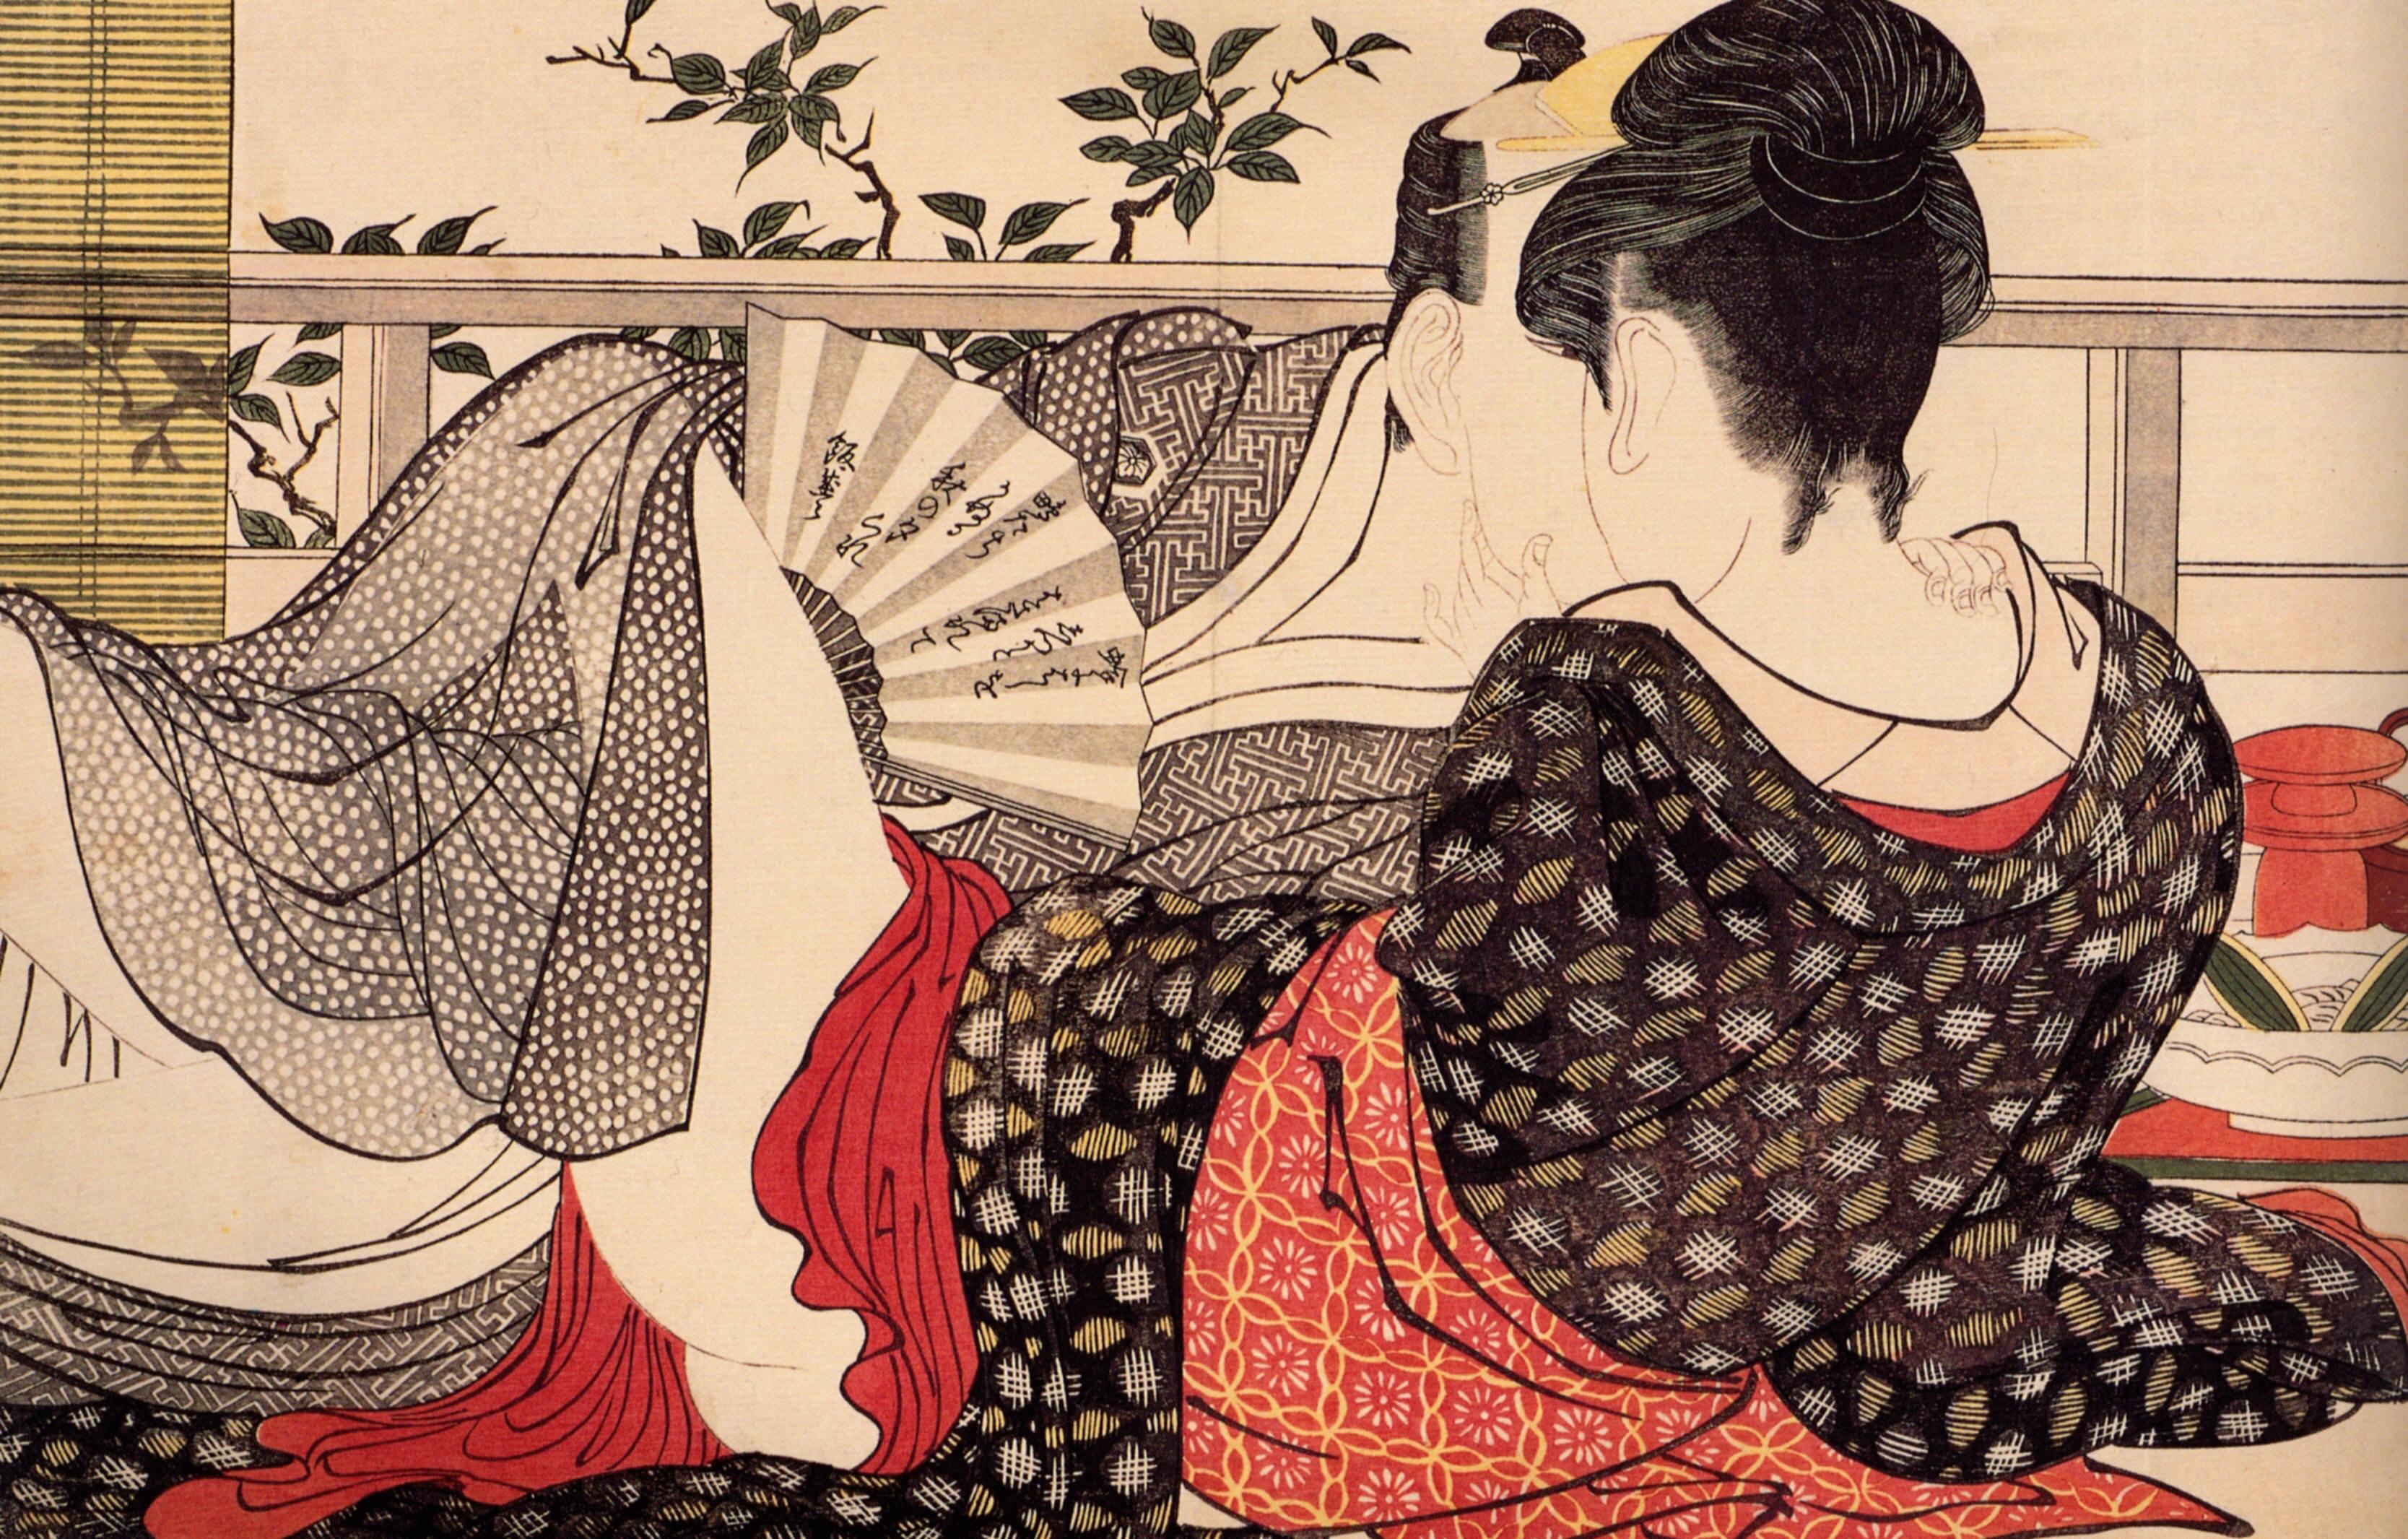 Китагава Утамаро (Kitagawa Utamaro) - японский художник